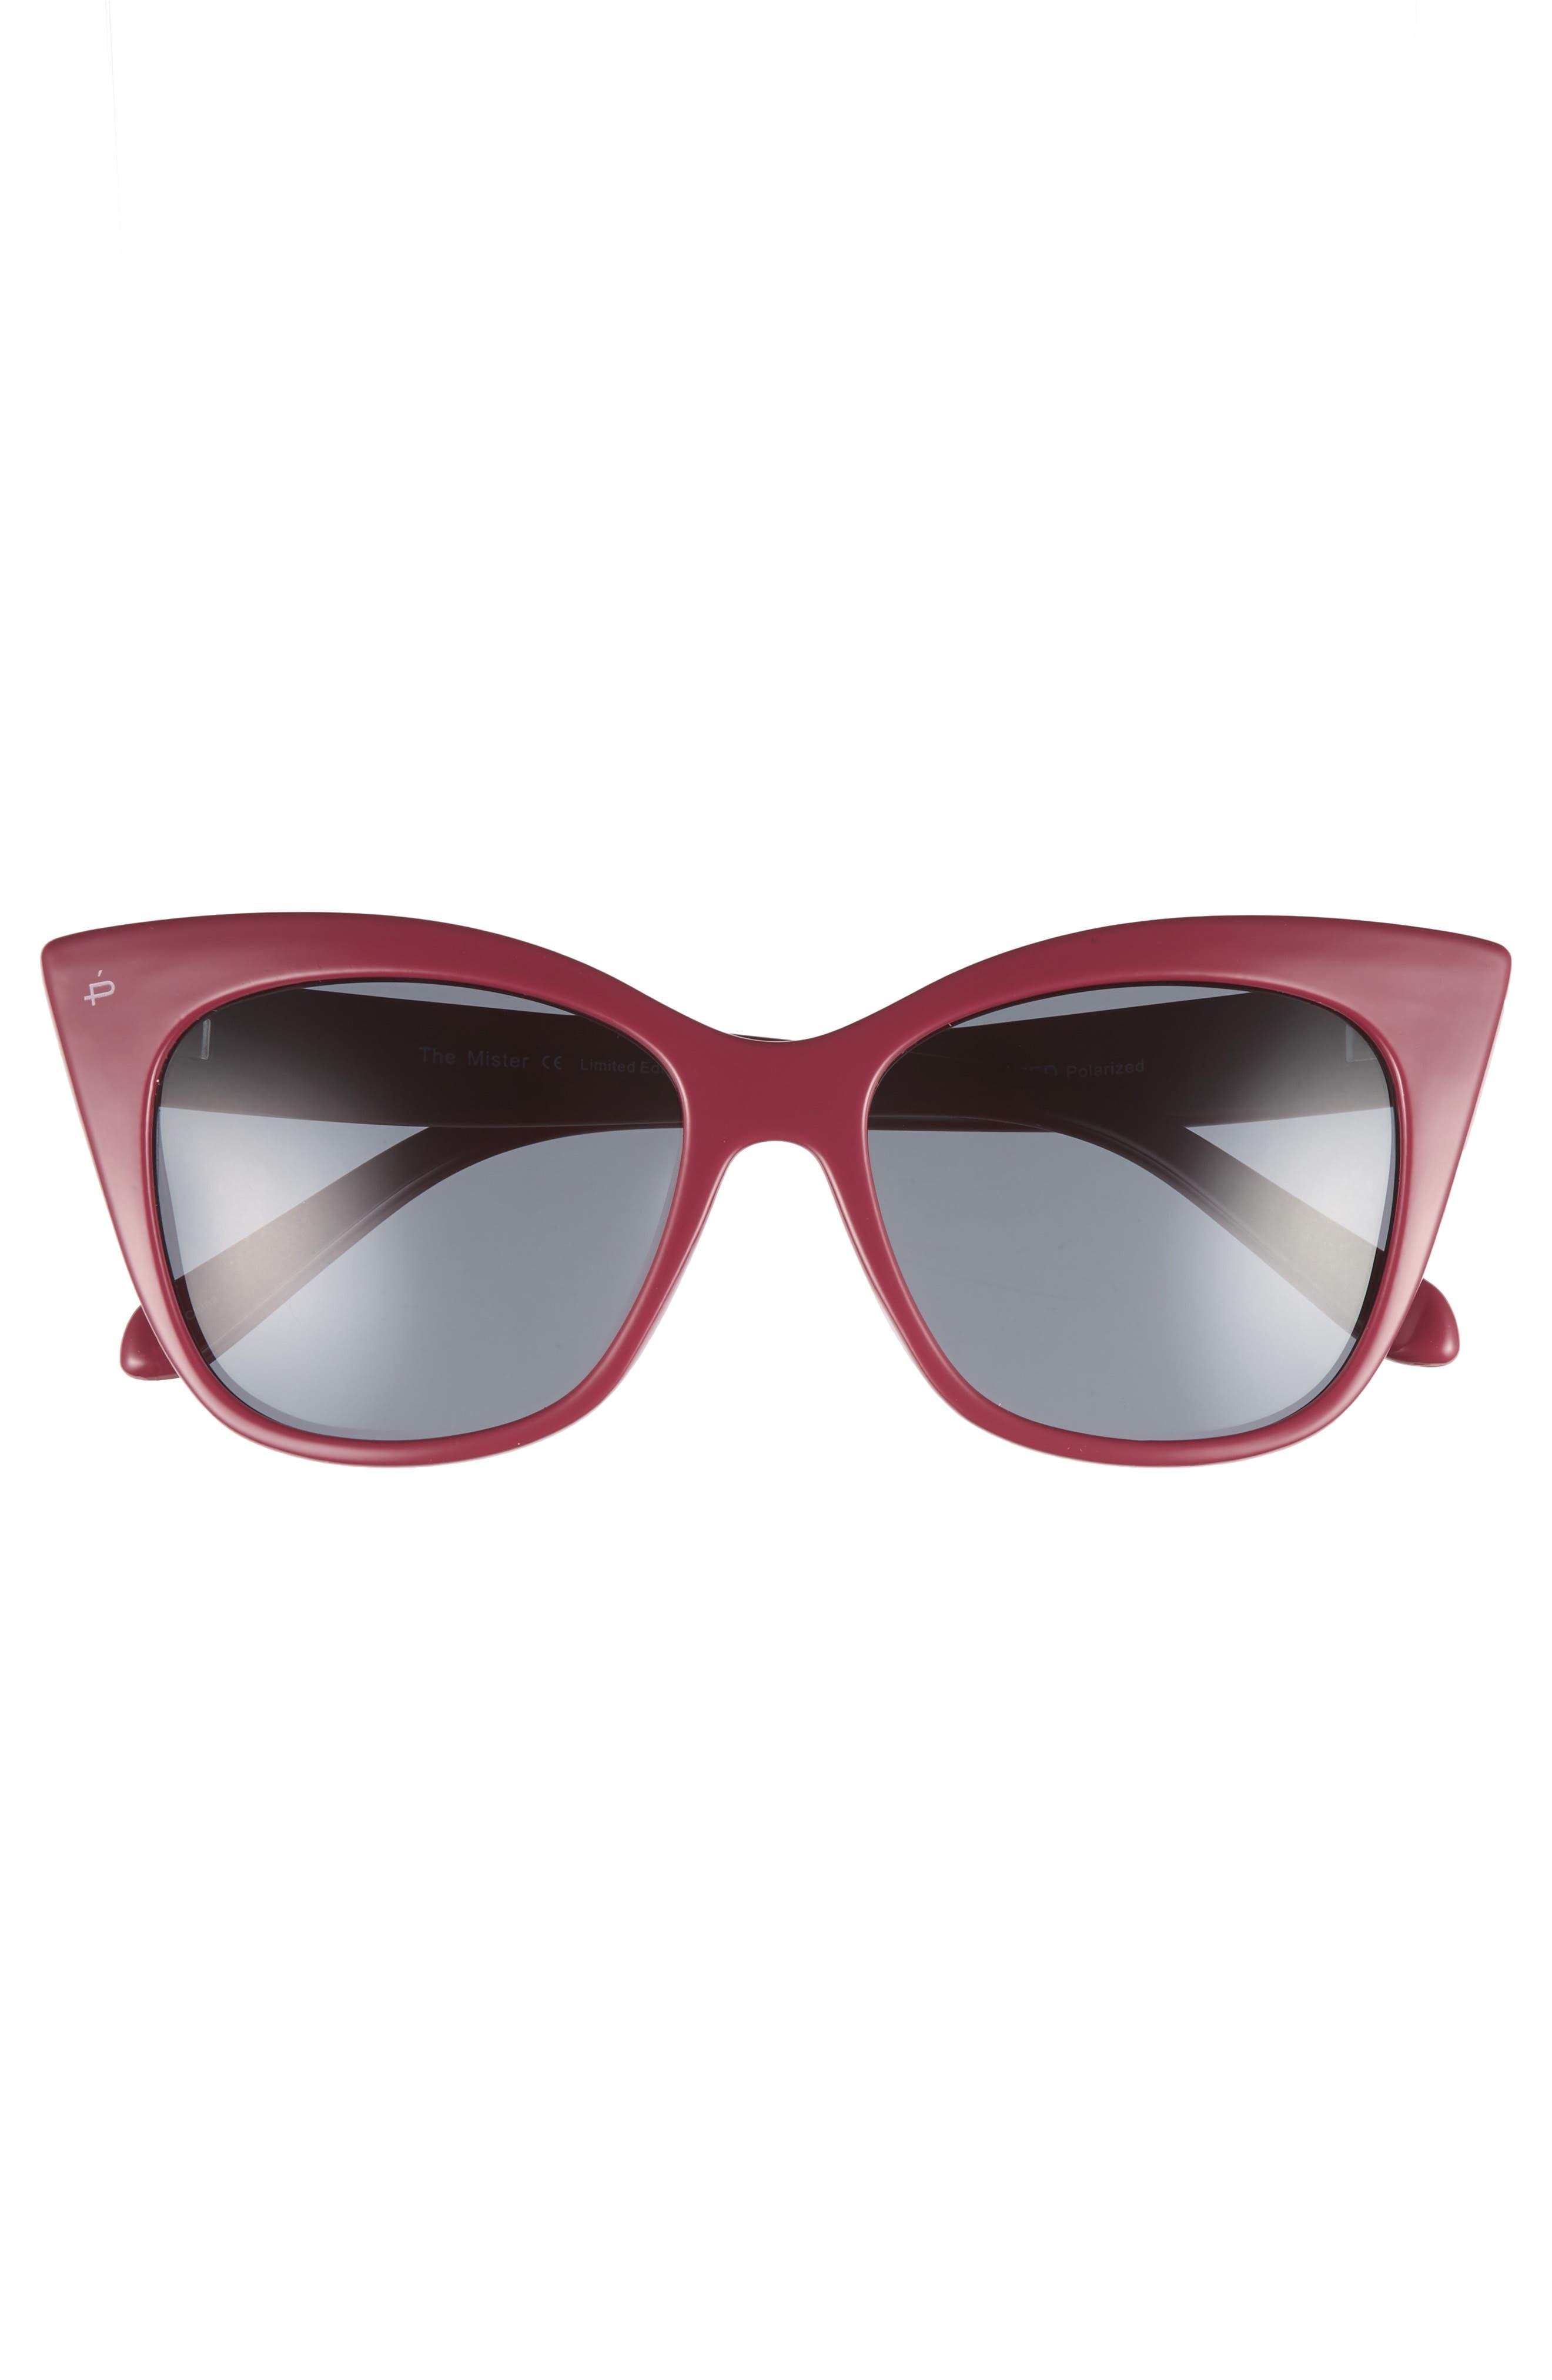 Privé Revaux x Madelaine Petsch The Mister 54mm Cat Eye Sunglasses,                             Alternate thumbnail 4, color,                             Red/ Black